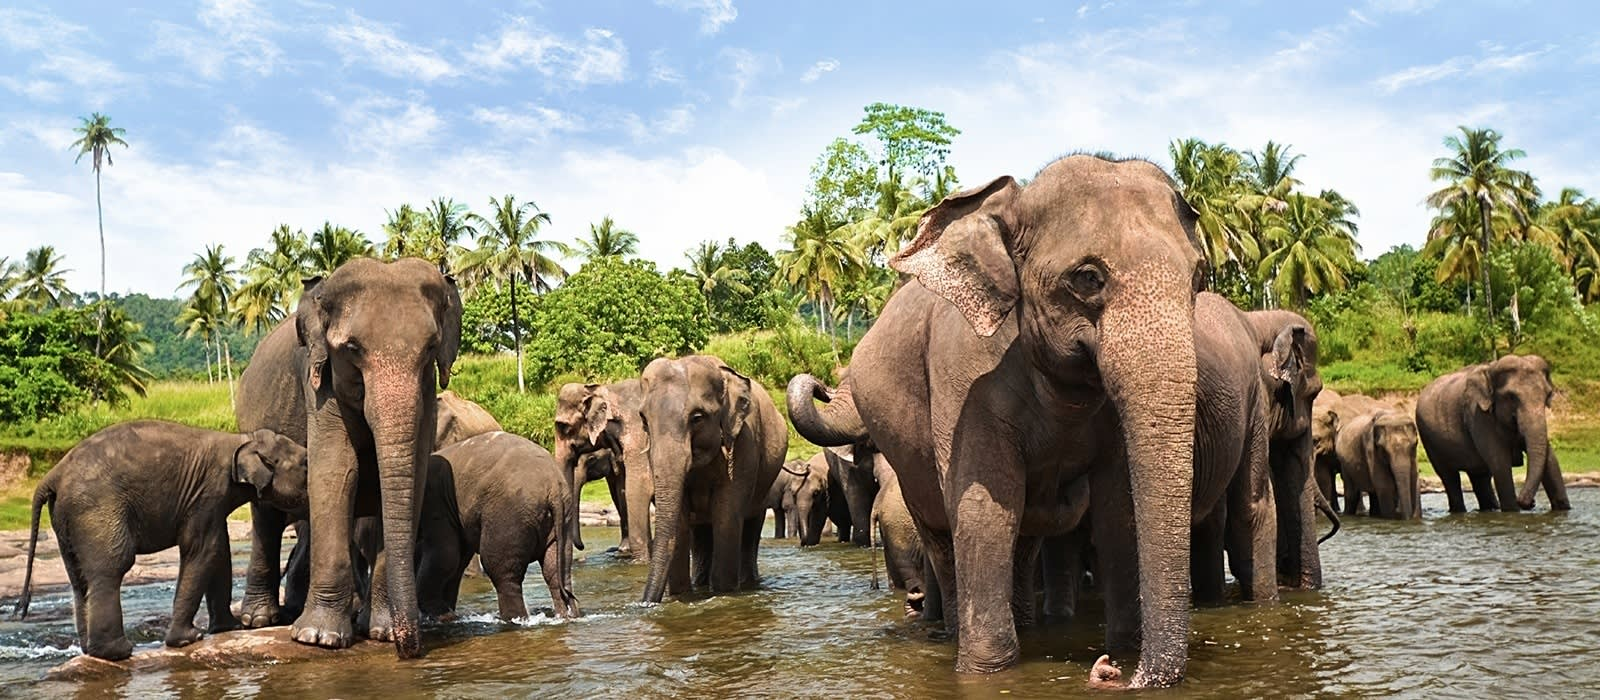 Is Sri Lanka safe